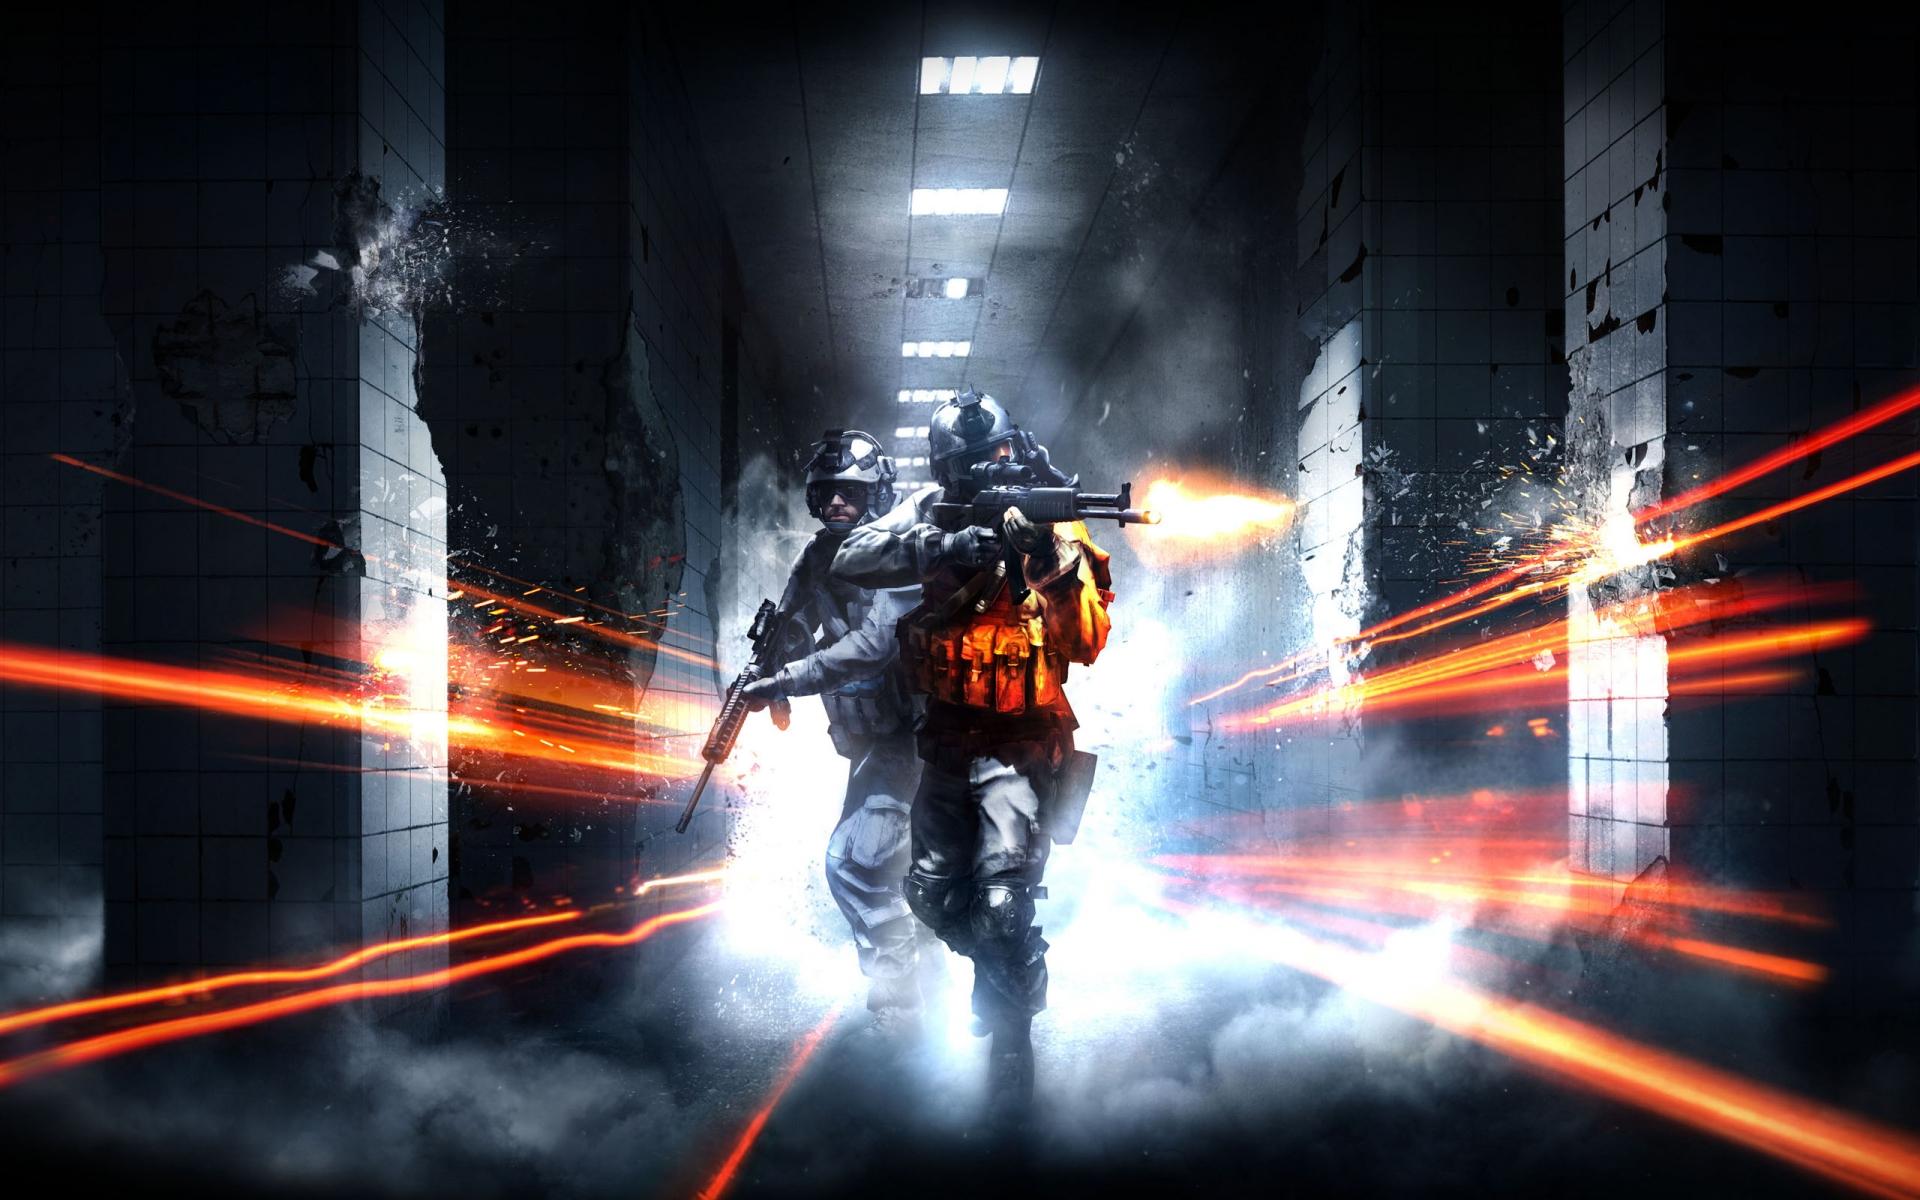 Cool Battlefield 4 Fire Armor In Black Background: Battlefield 3 Final Hour Video Games Military Warriors